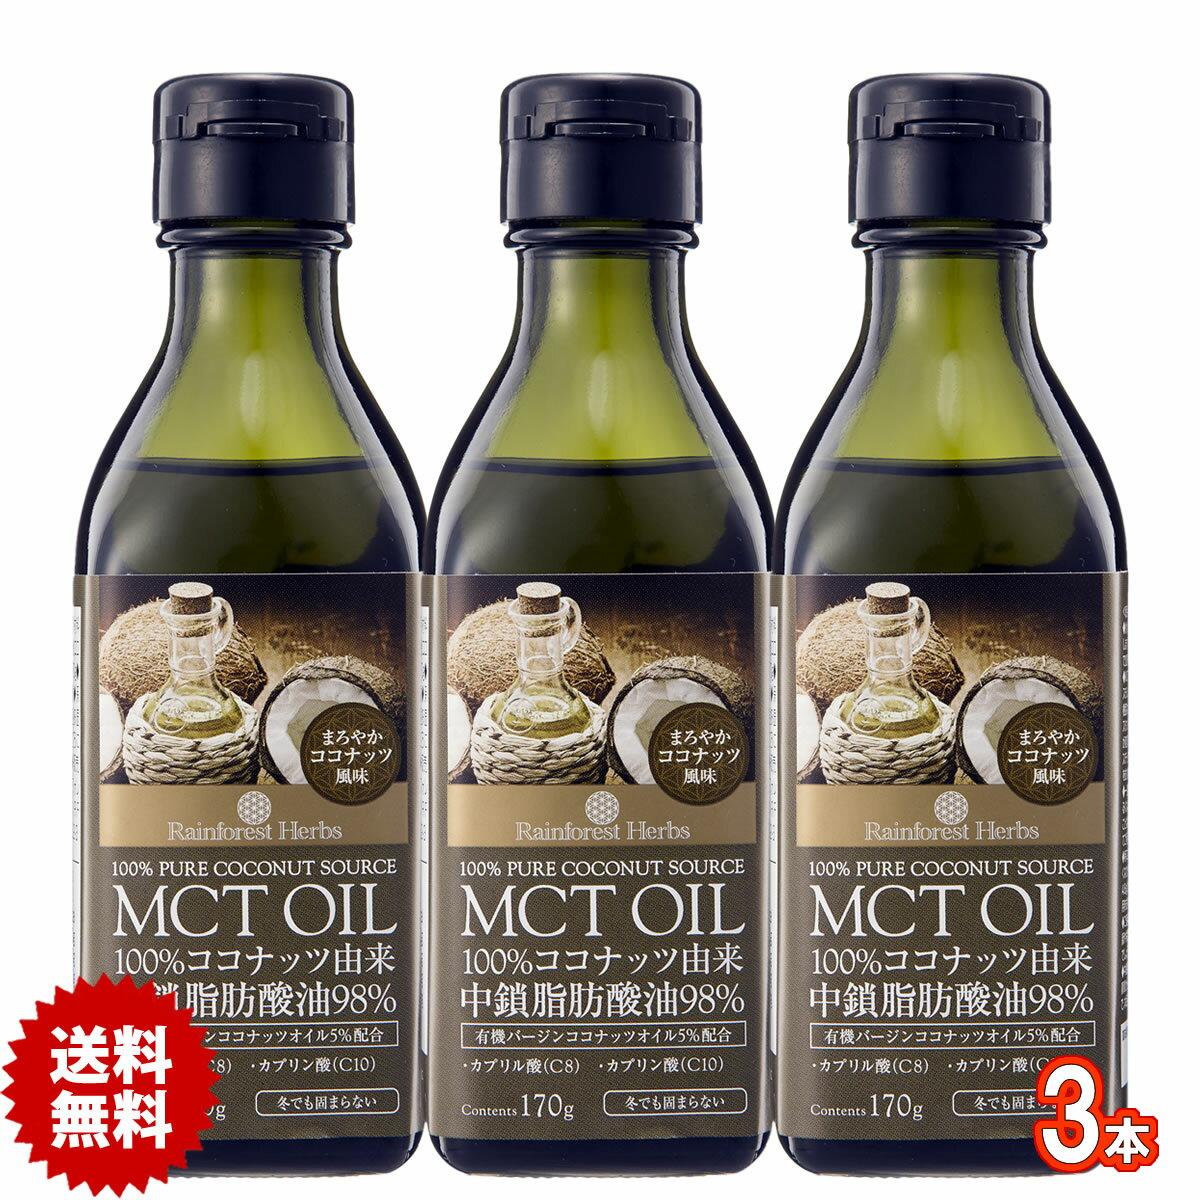 MCTオイル ココナッツ由来100% 170g 3本 タイ産 MCT OIL 100% PURE COCONUT SOURCE 送料無料